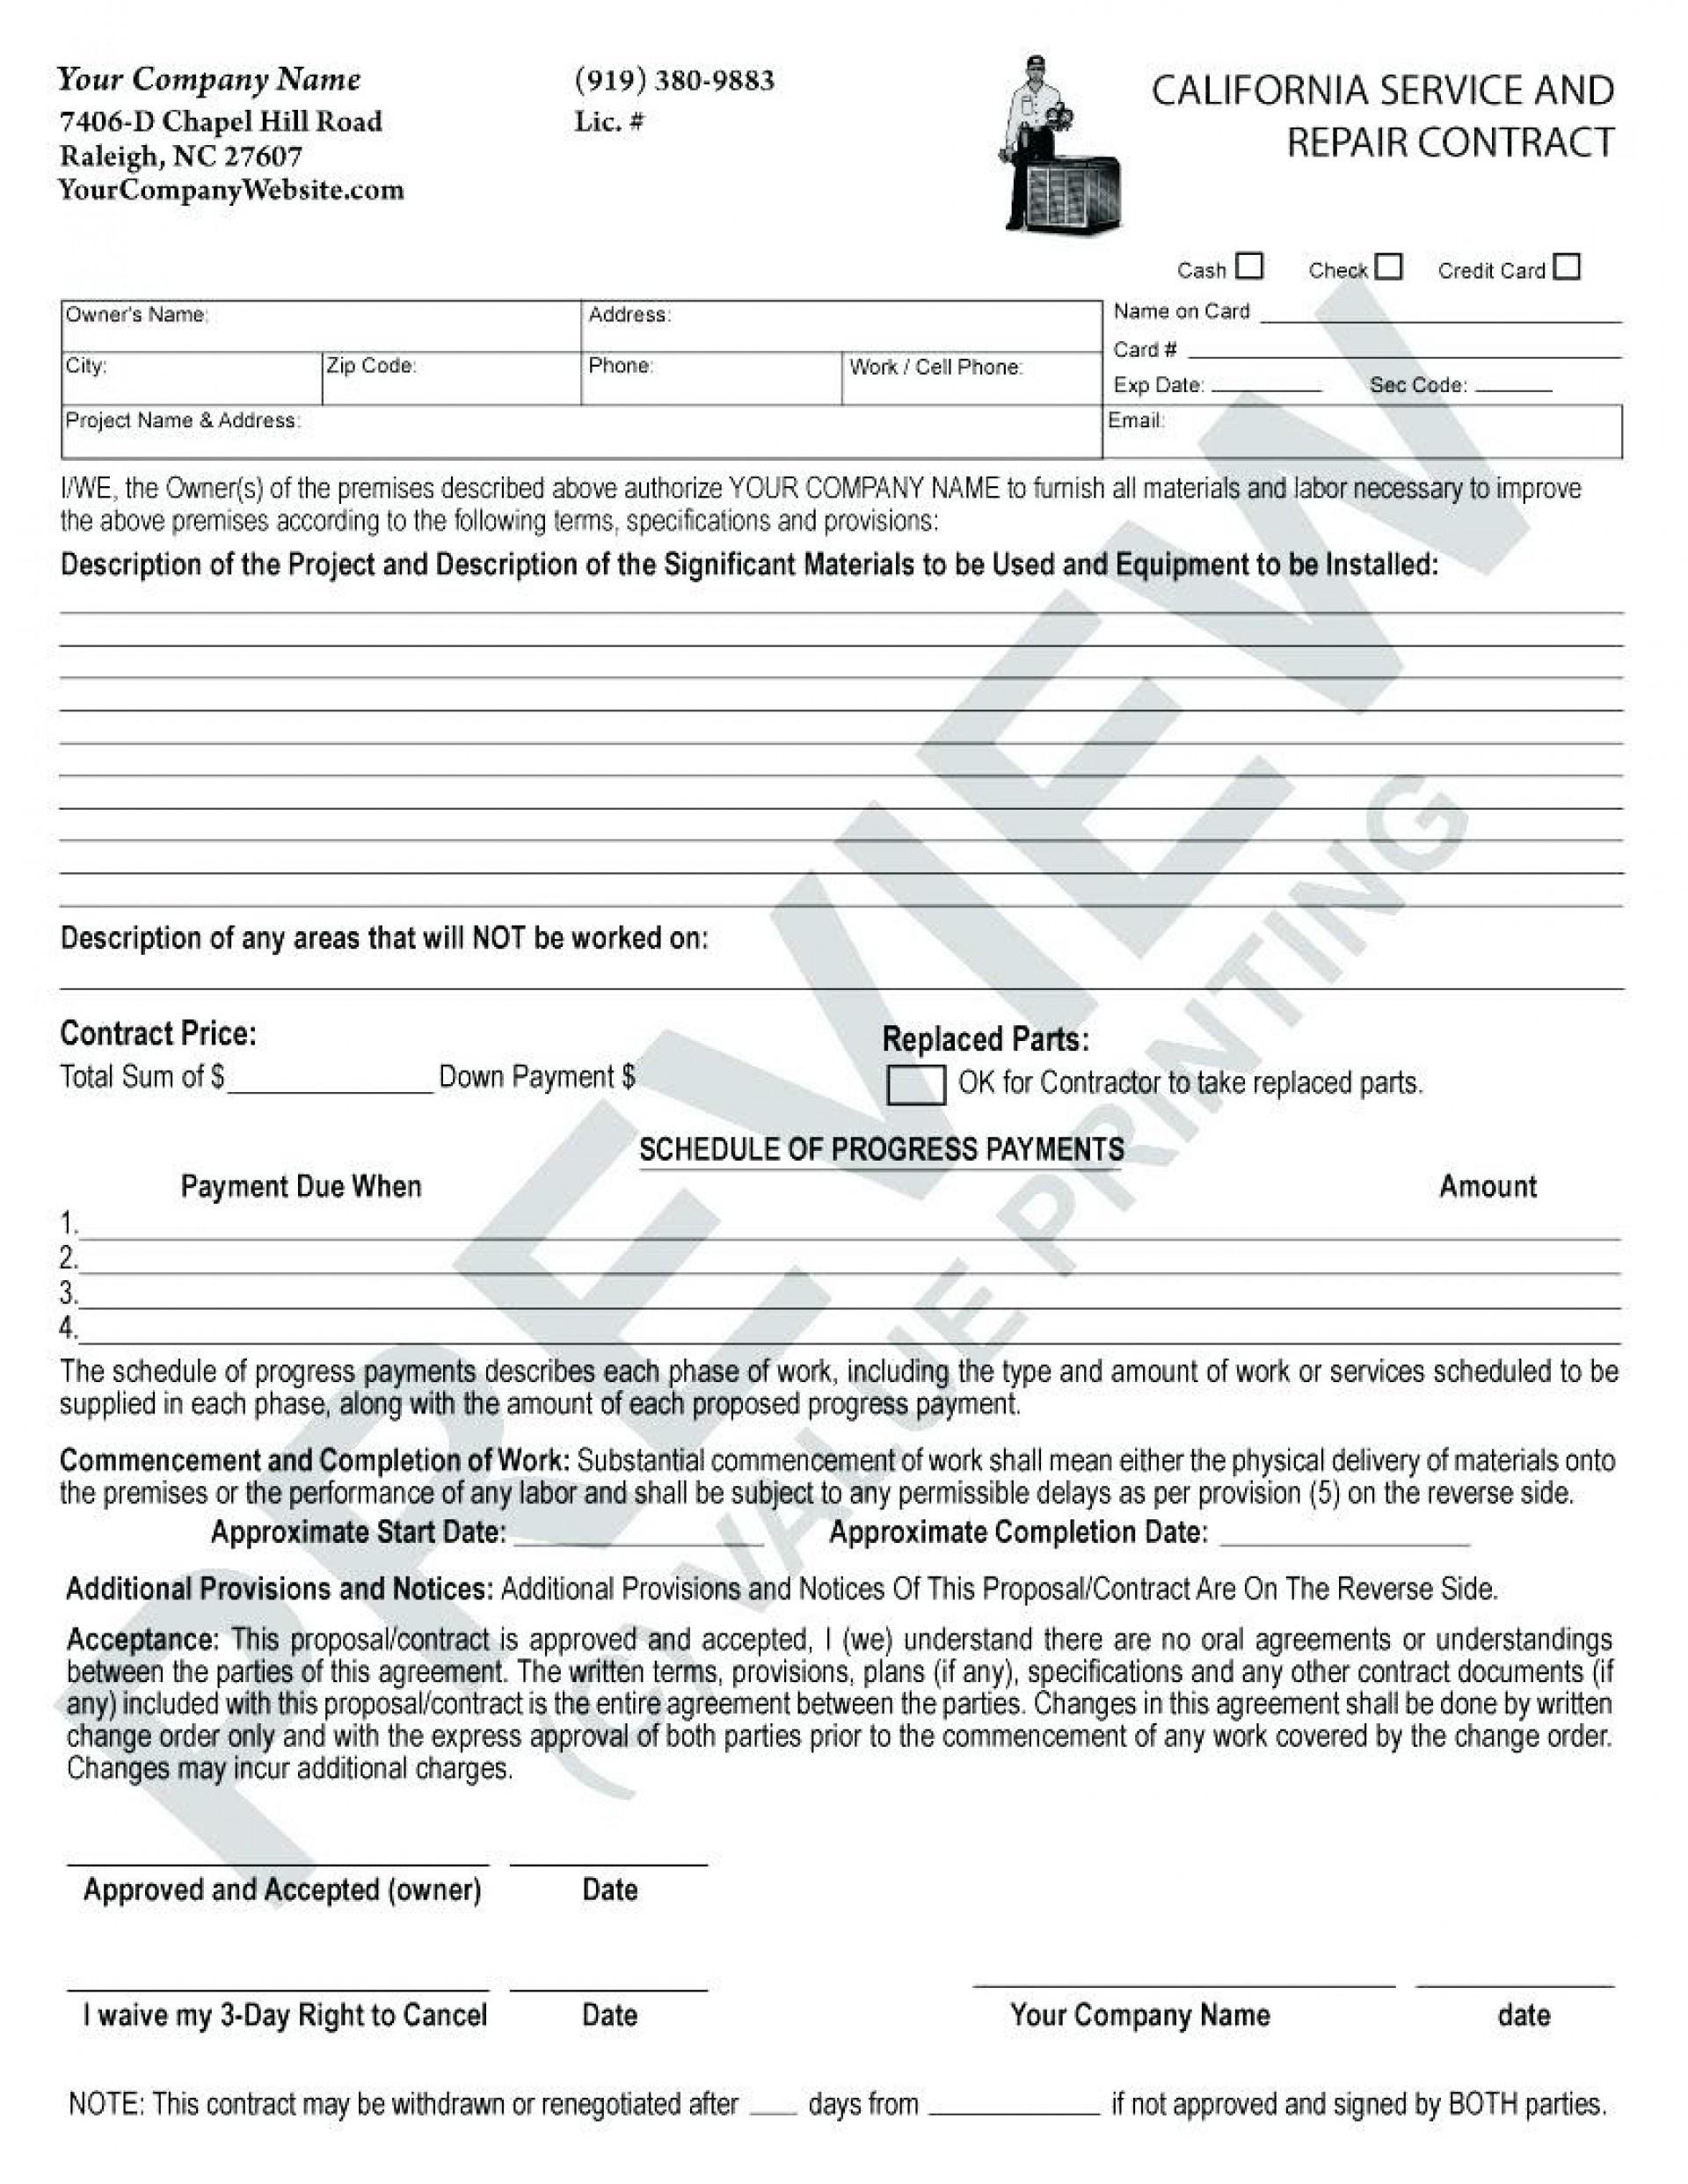 020 Hvac Service Contractate Maintenance Agreement Forms Free - Free Printable Service Contract Forms